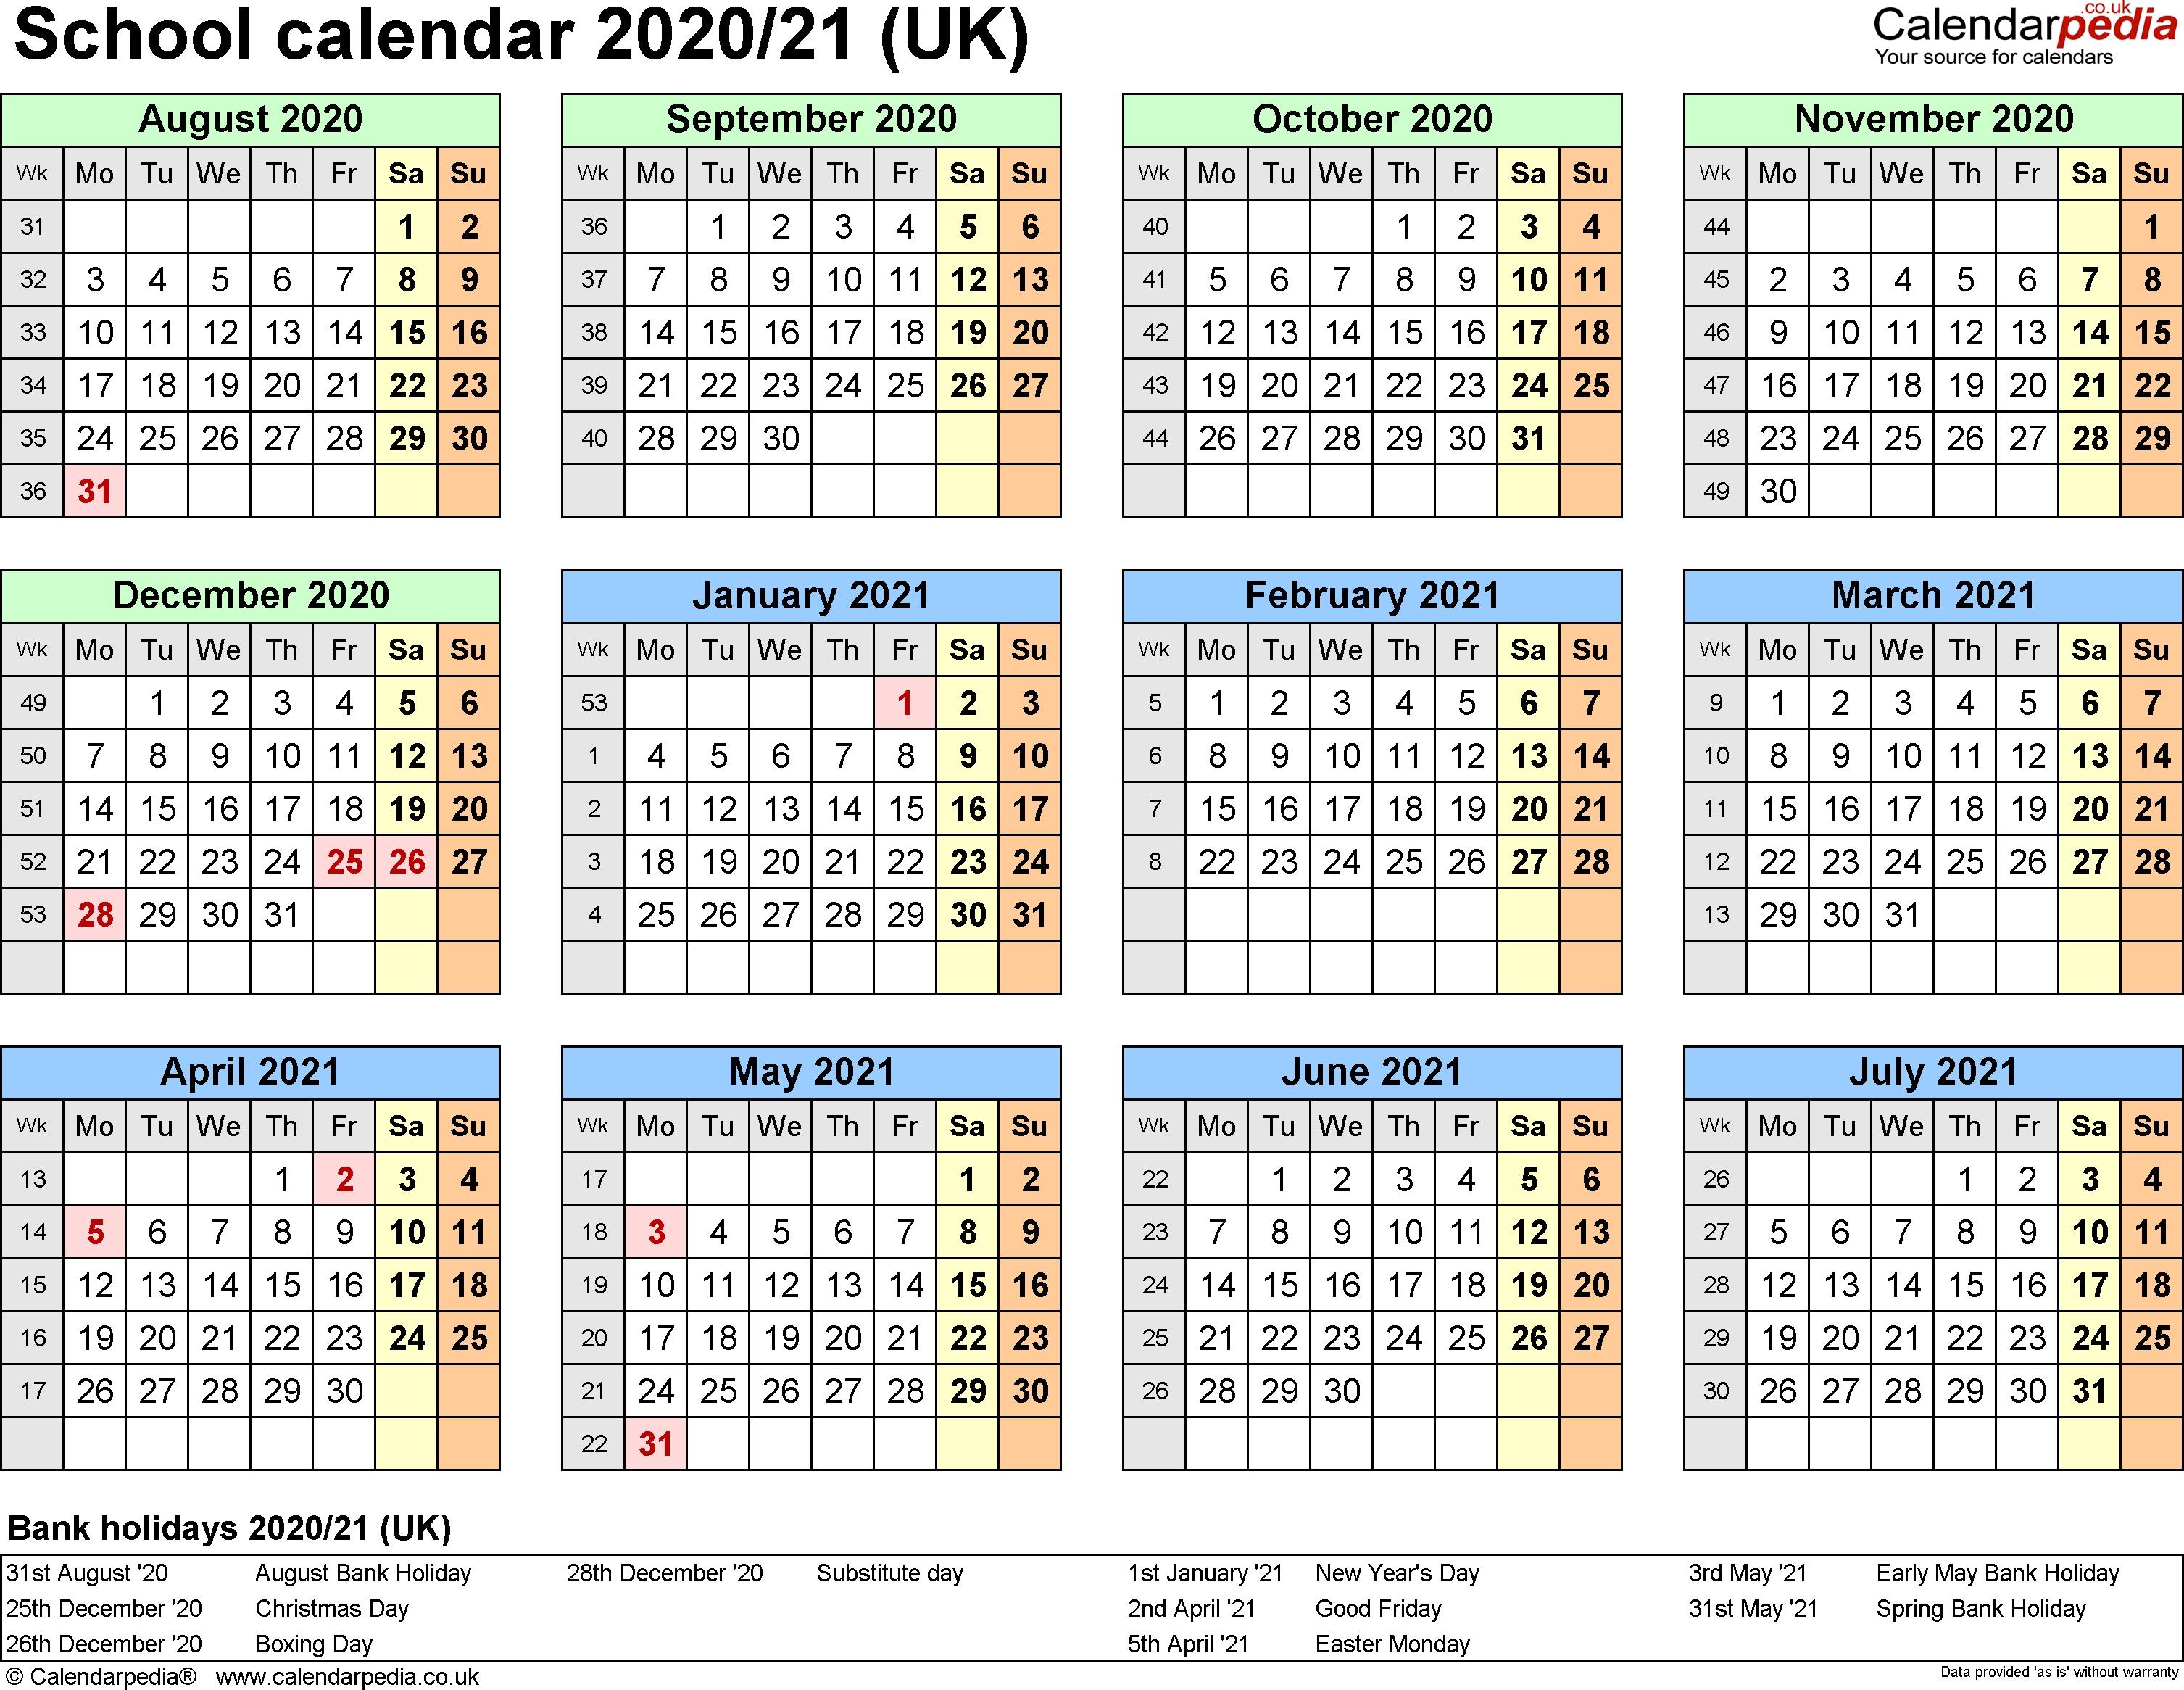 School Calendars 2020/2021 As Free Printable Excel Templates-Calendar 2020 Printable With Bank Holidays